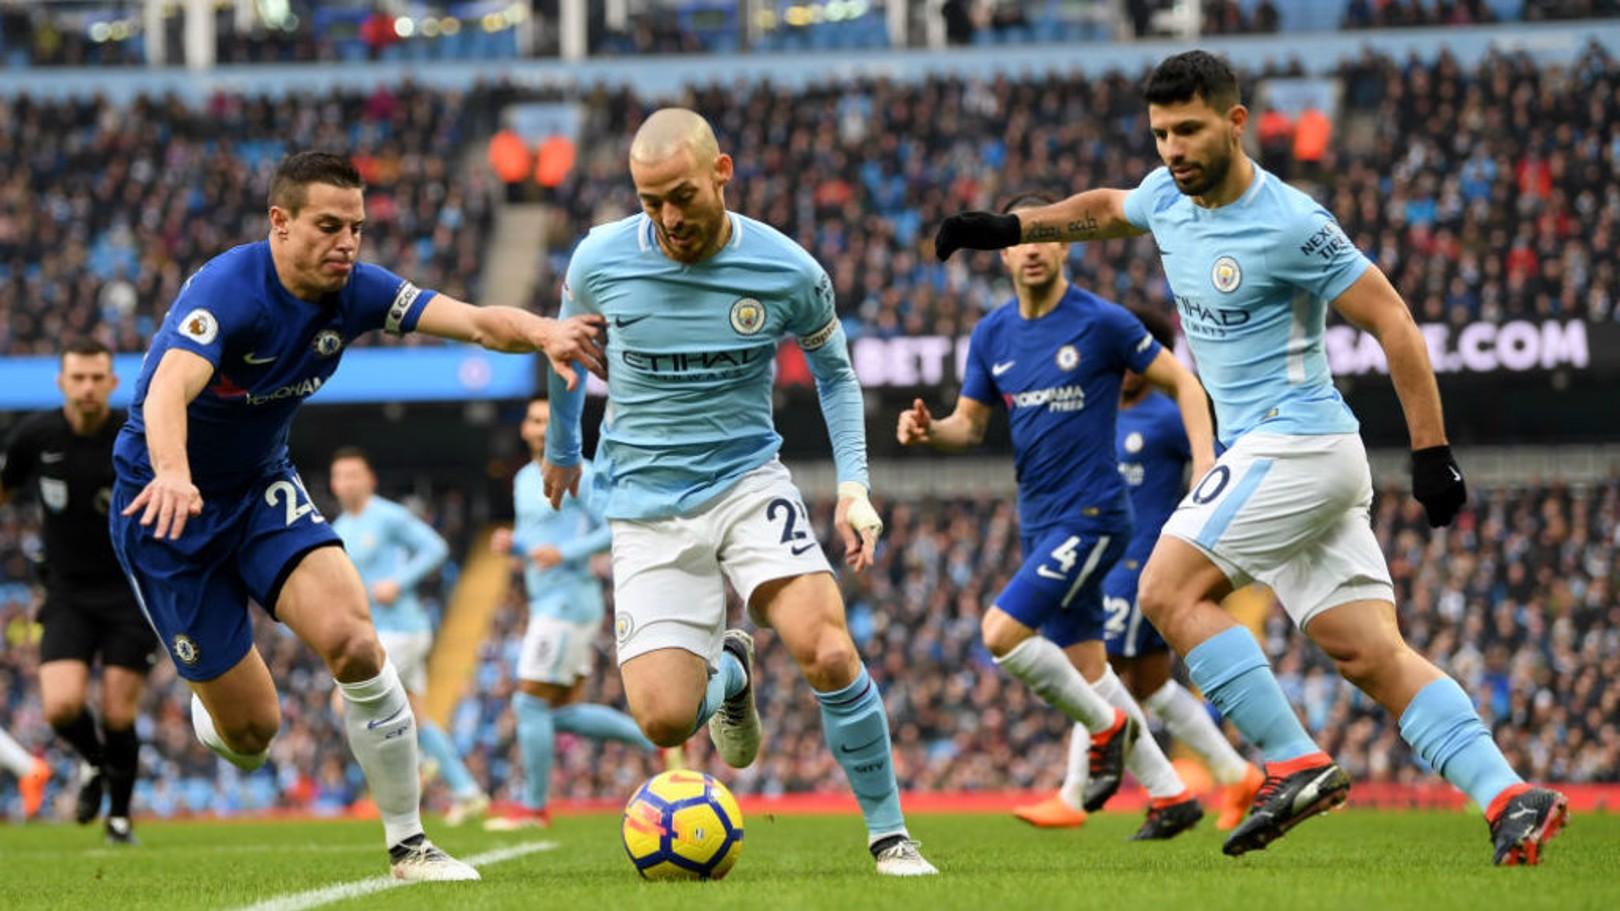 SKIPPER: David Silva wore the captain's armband against Chelsea.